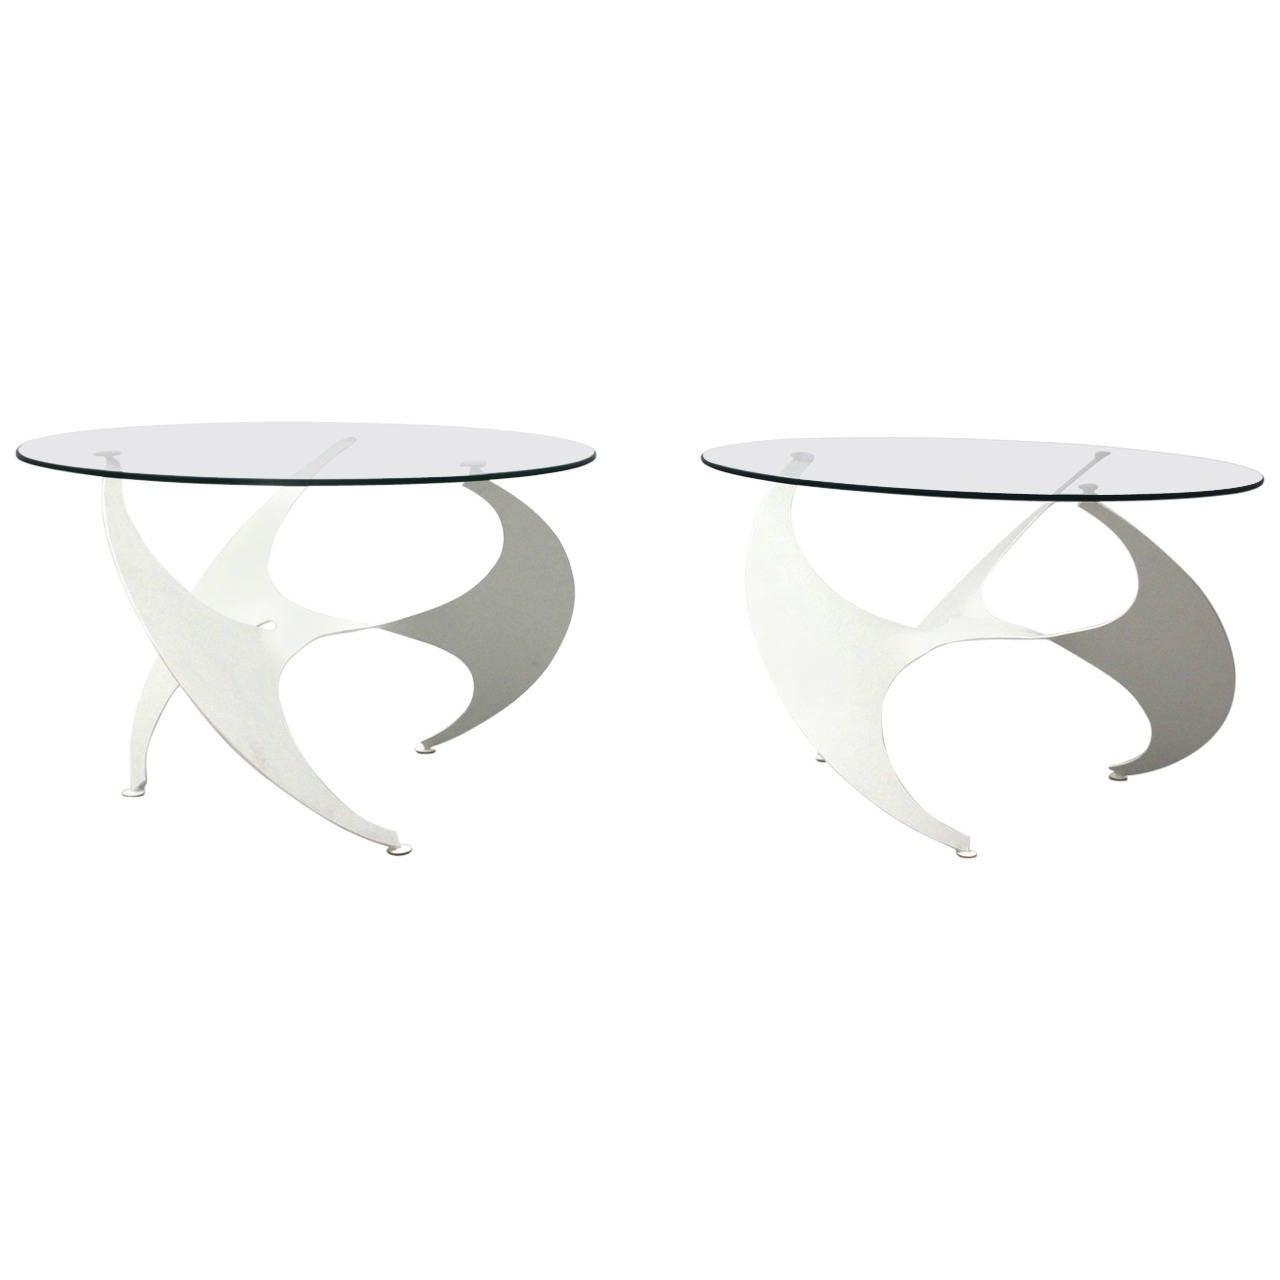 "Pair of Steel ""Propeller Tables"" by Knut Hesterberg, Germany, c. 1964"